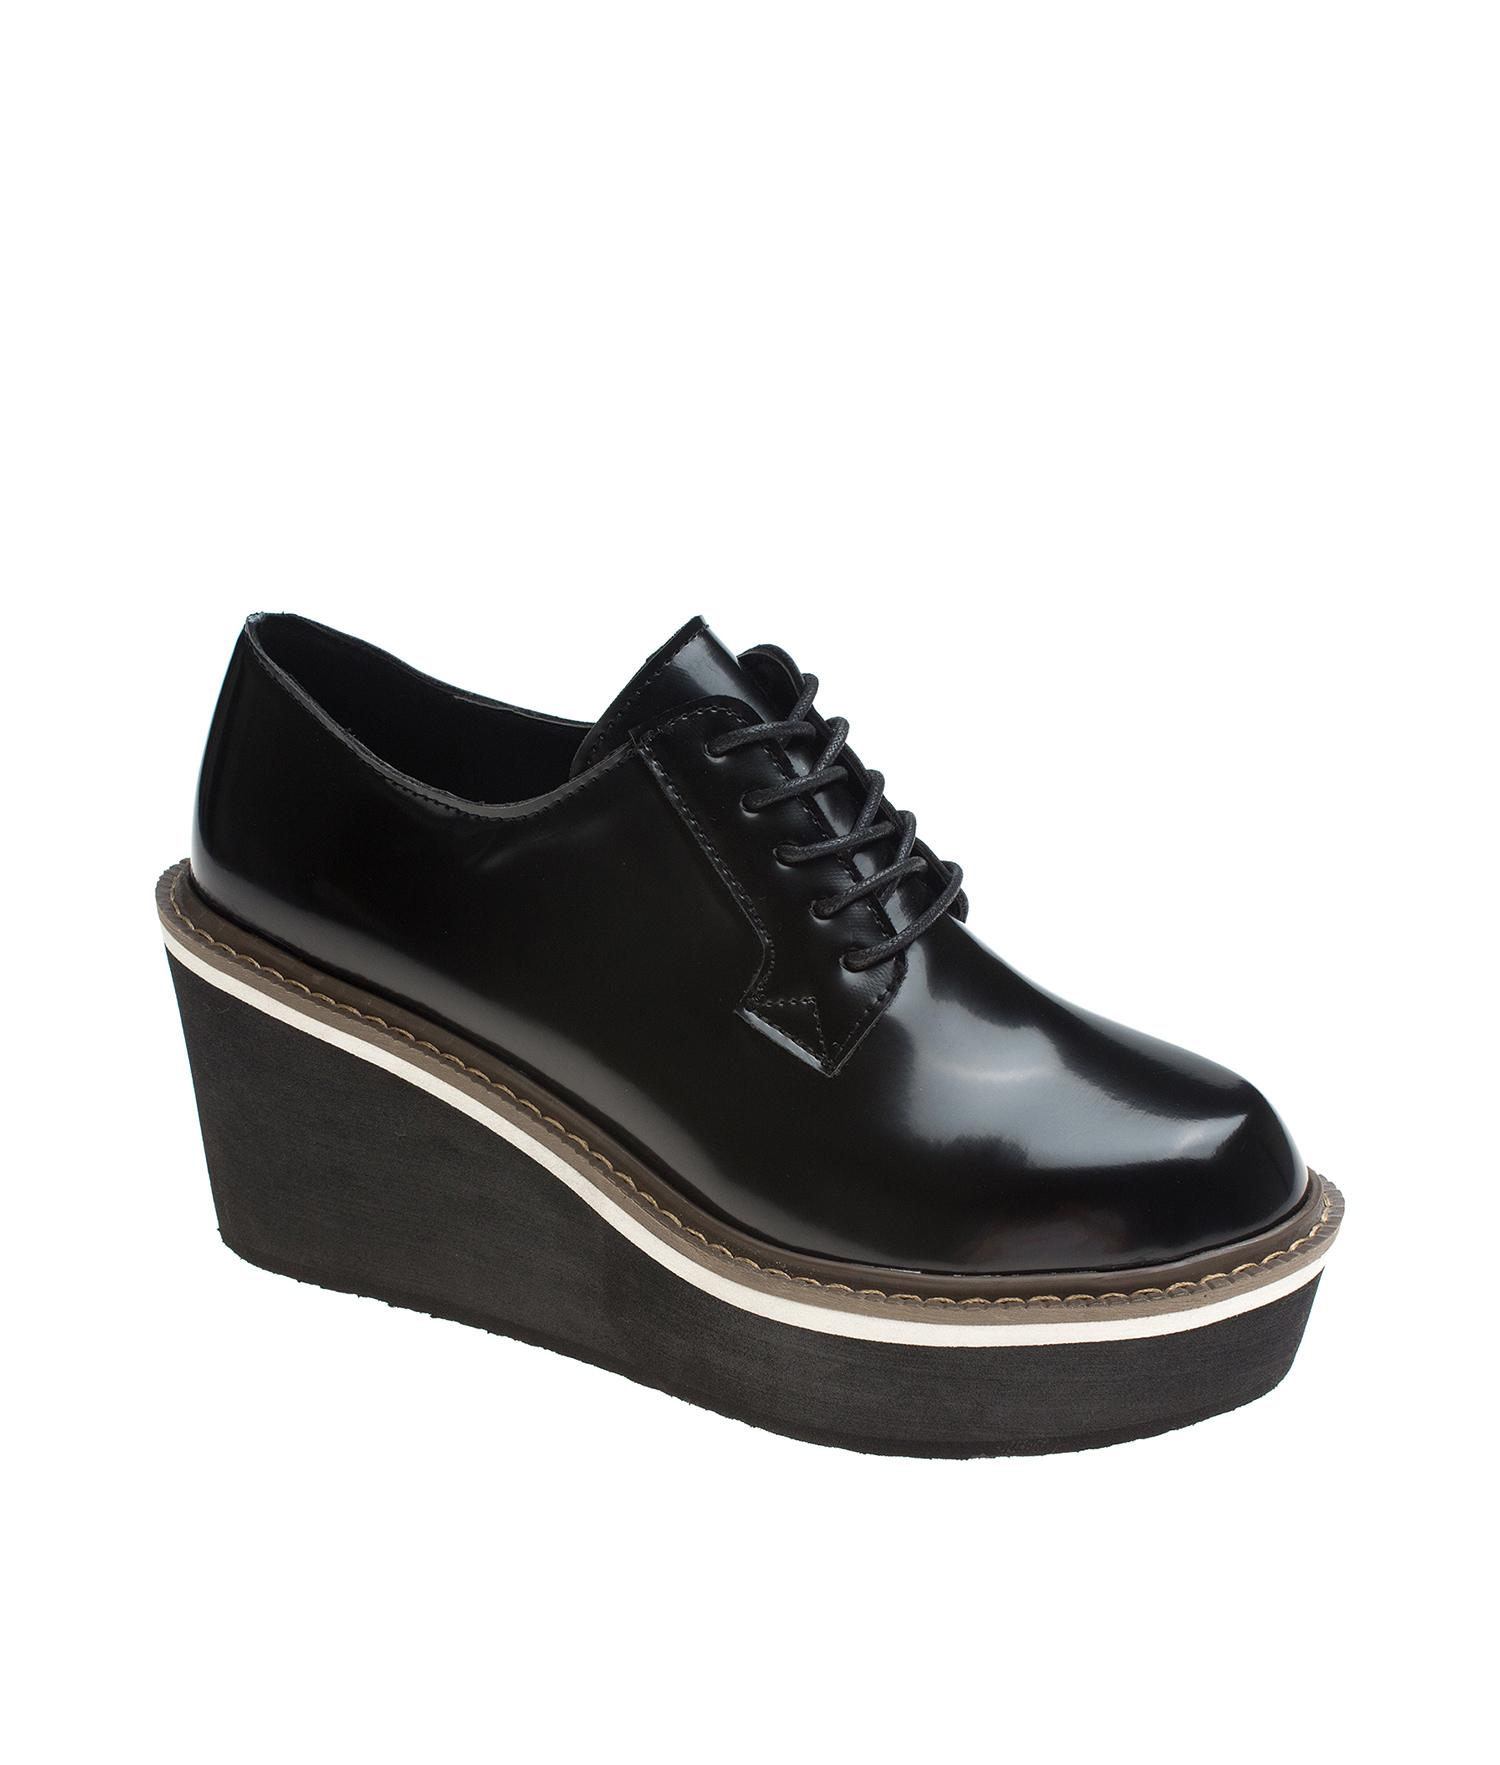 d94da624624 Black Platform Wedge Oxford Creeper Shoes - annakastleshoes.com